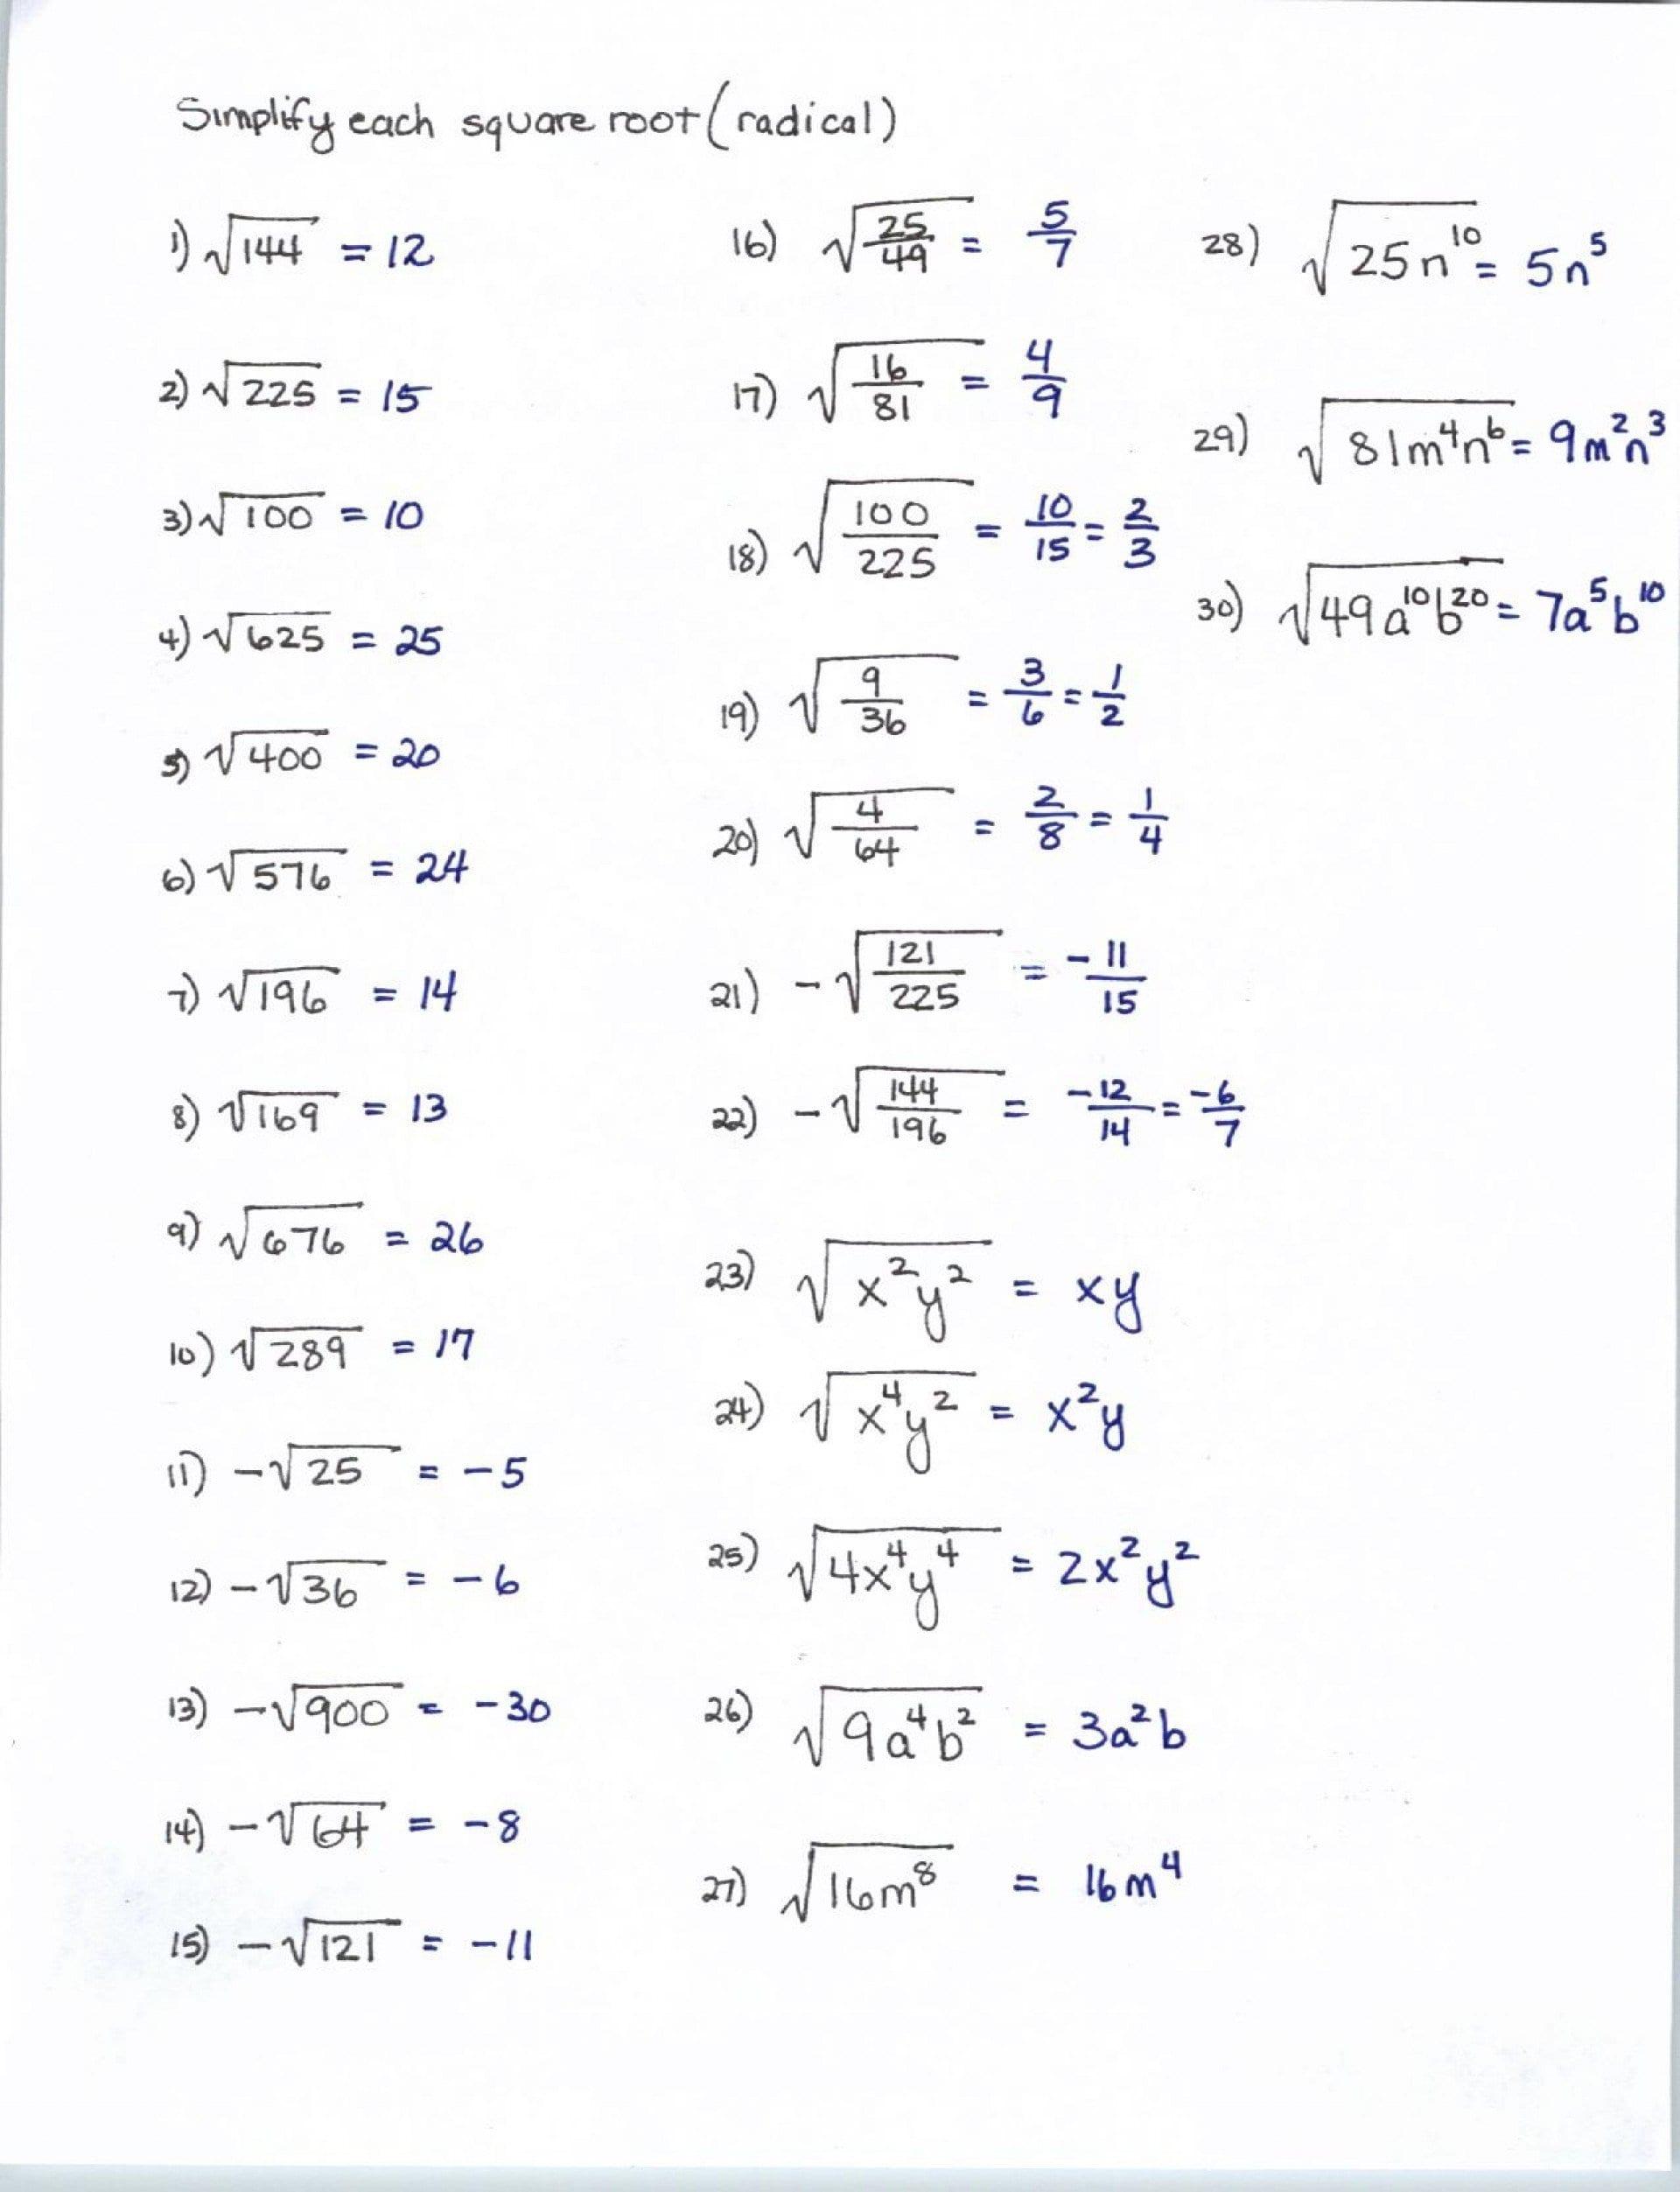 Cryptic Quiz Math Worksheet Answers  Yooob Intended For Cryptic Quiz Worksheet Answers